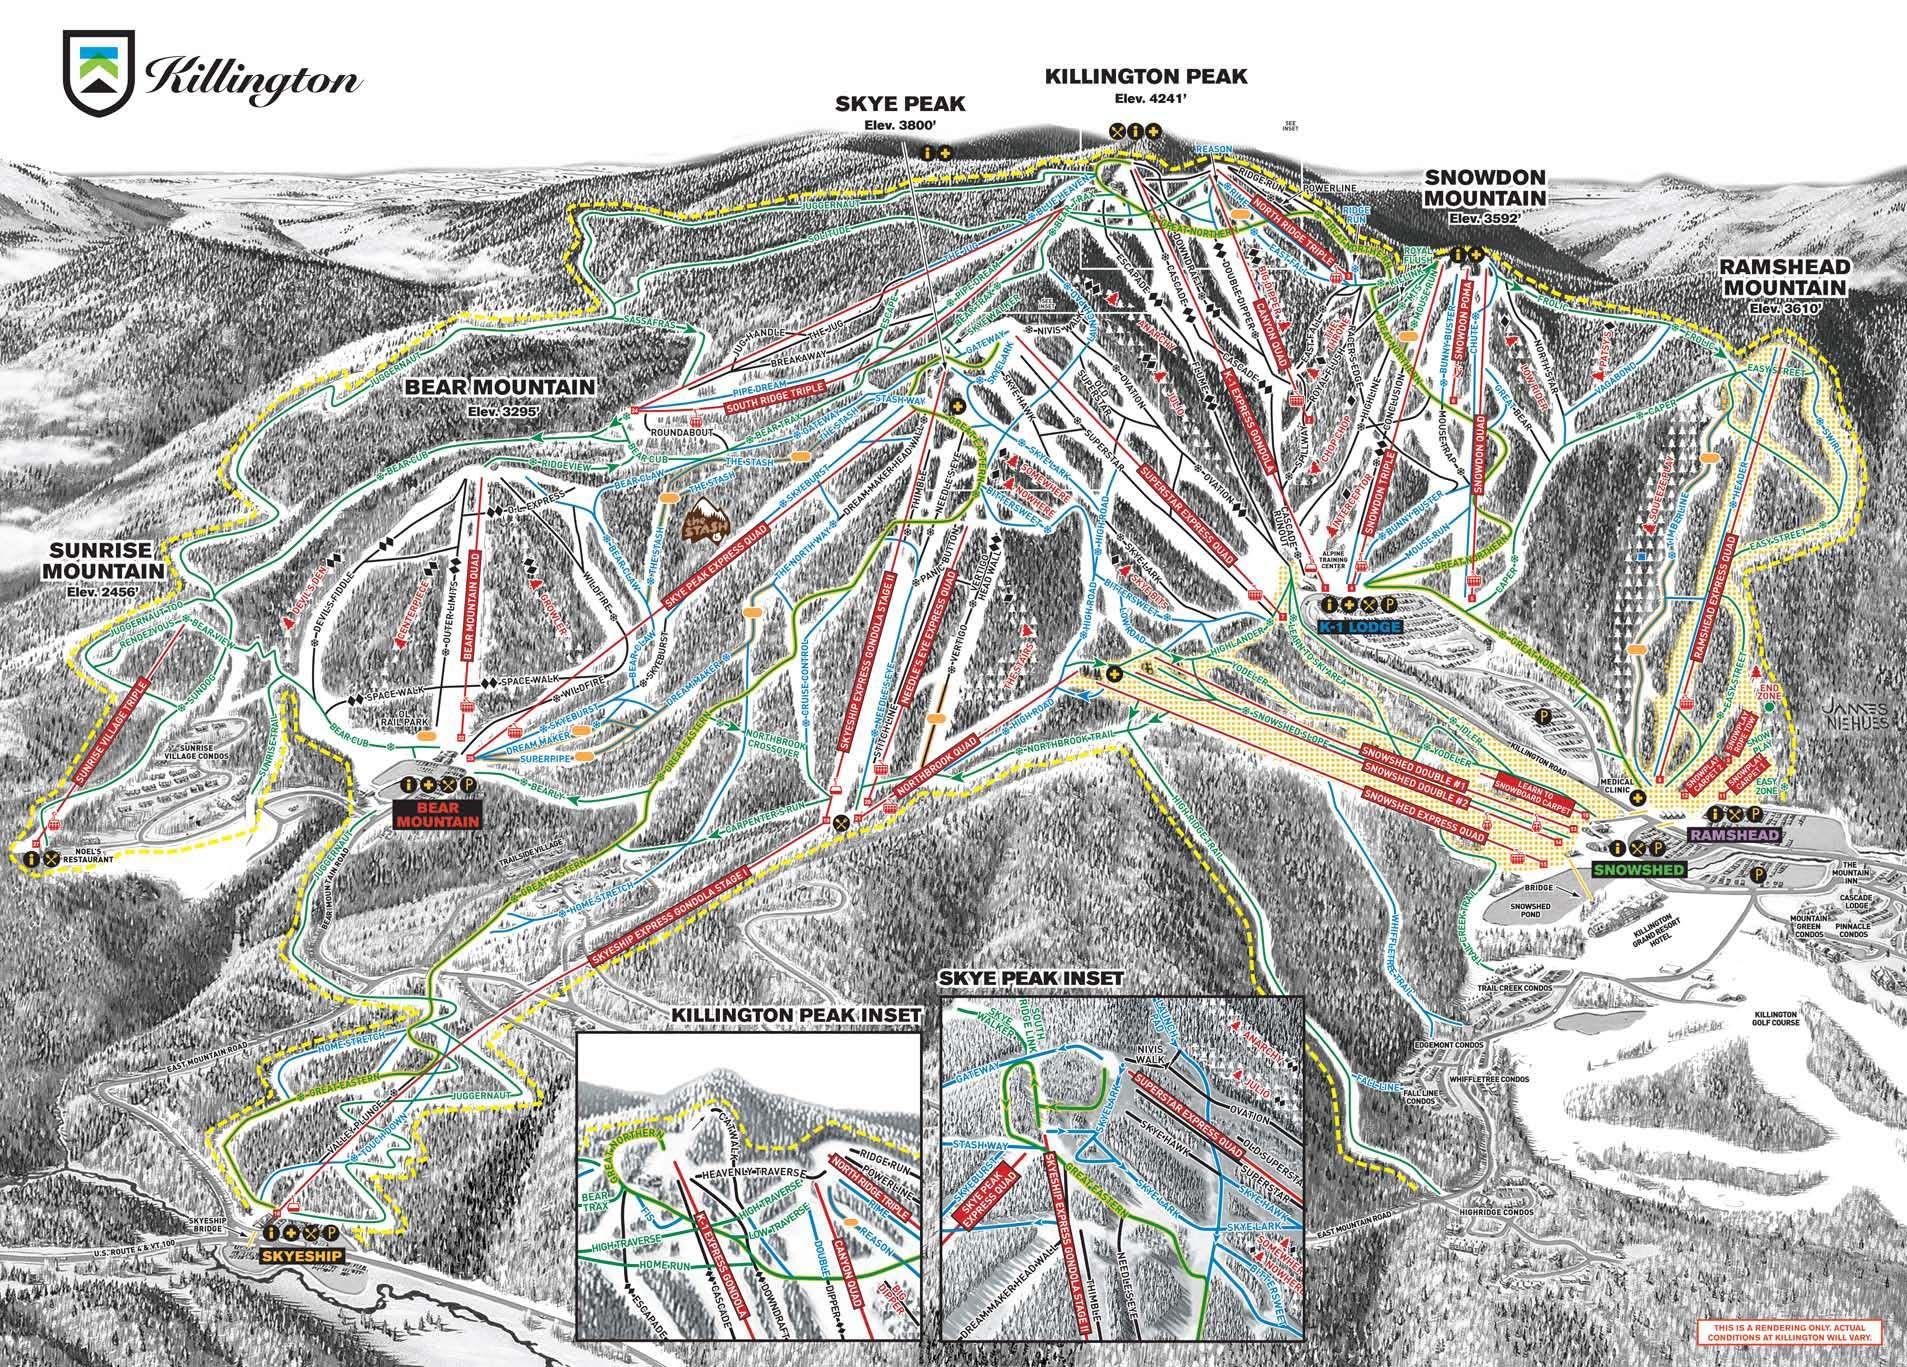 Killington Ski Resort in 2019 | Skiing | Killington resort ... on stowe ski map, lutsen mountains ski map, north carolina ski map, marmot basin ski map, breckenridge ski map, cannon mountain ski map, okemo ski map, pico ski map, wild mountain ski map, connecticut ski map, mount snow ski map, mount kato ski map, bradford ski map, shawnee peak ski map, bretton woods ski map, greek peak ski map, diamond peak ski map, snowshoe mountain ski map, 49 degrees north ski map, tyrol basin ski map,